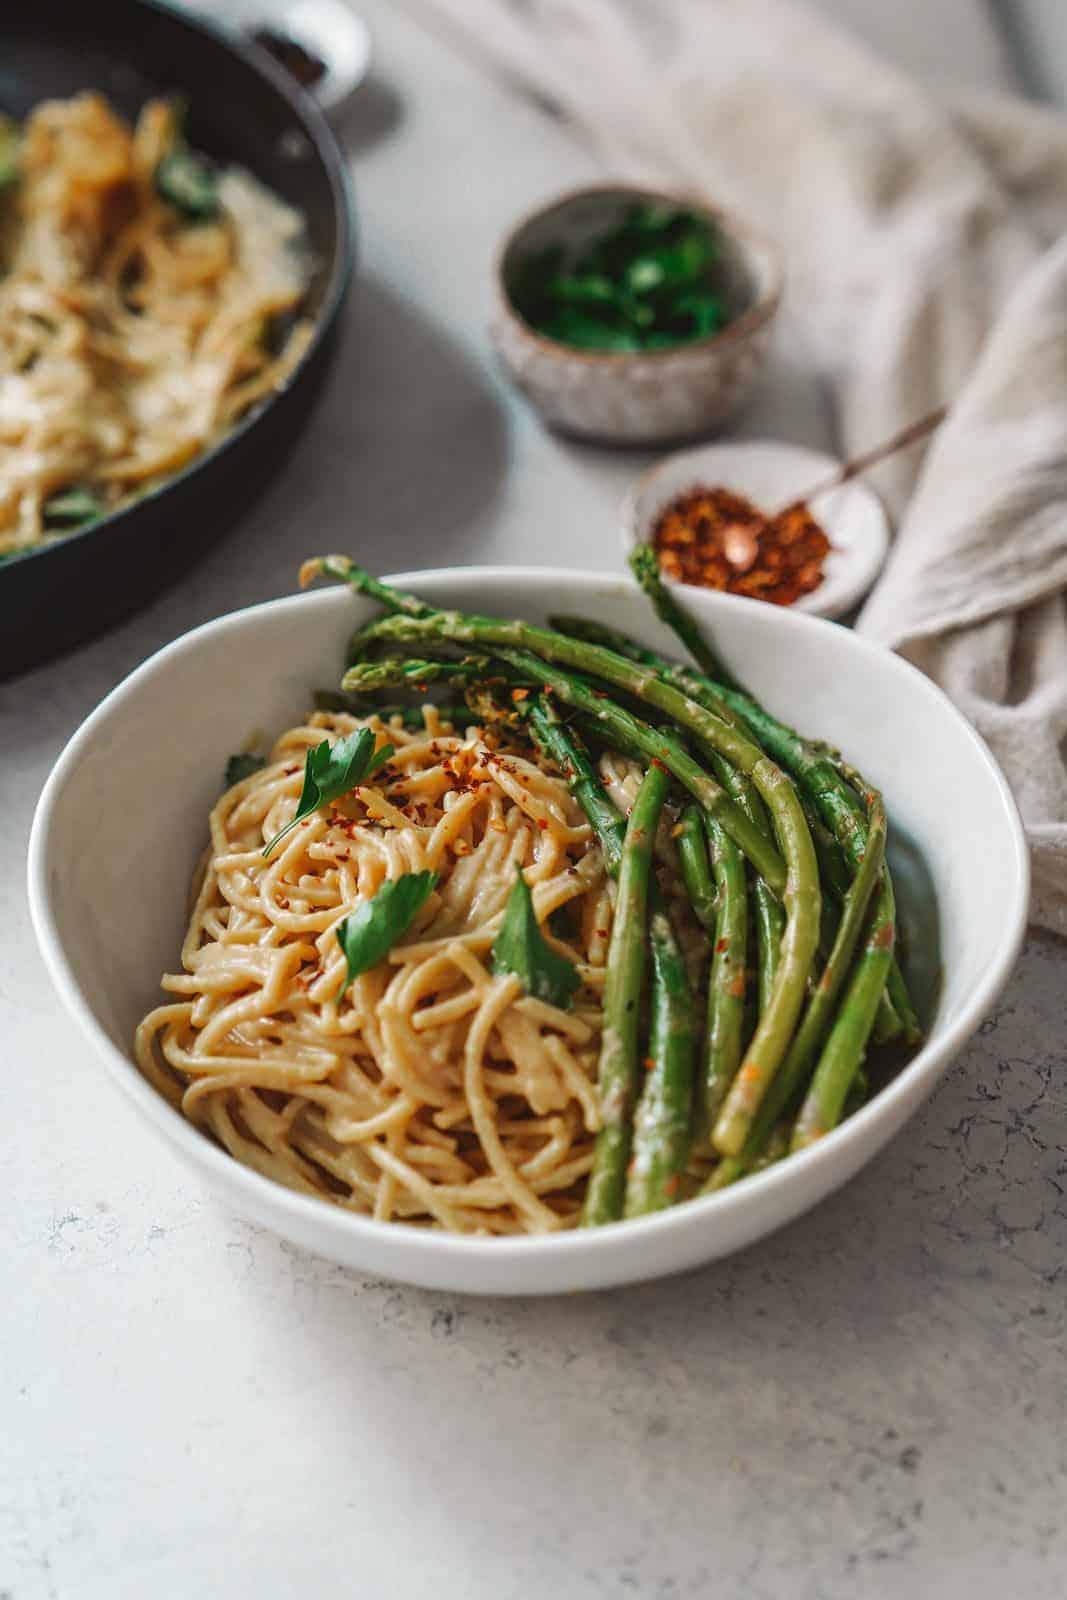 Bowl of spaghetti with vegan white wine pasta sauce + asparagus on table.